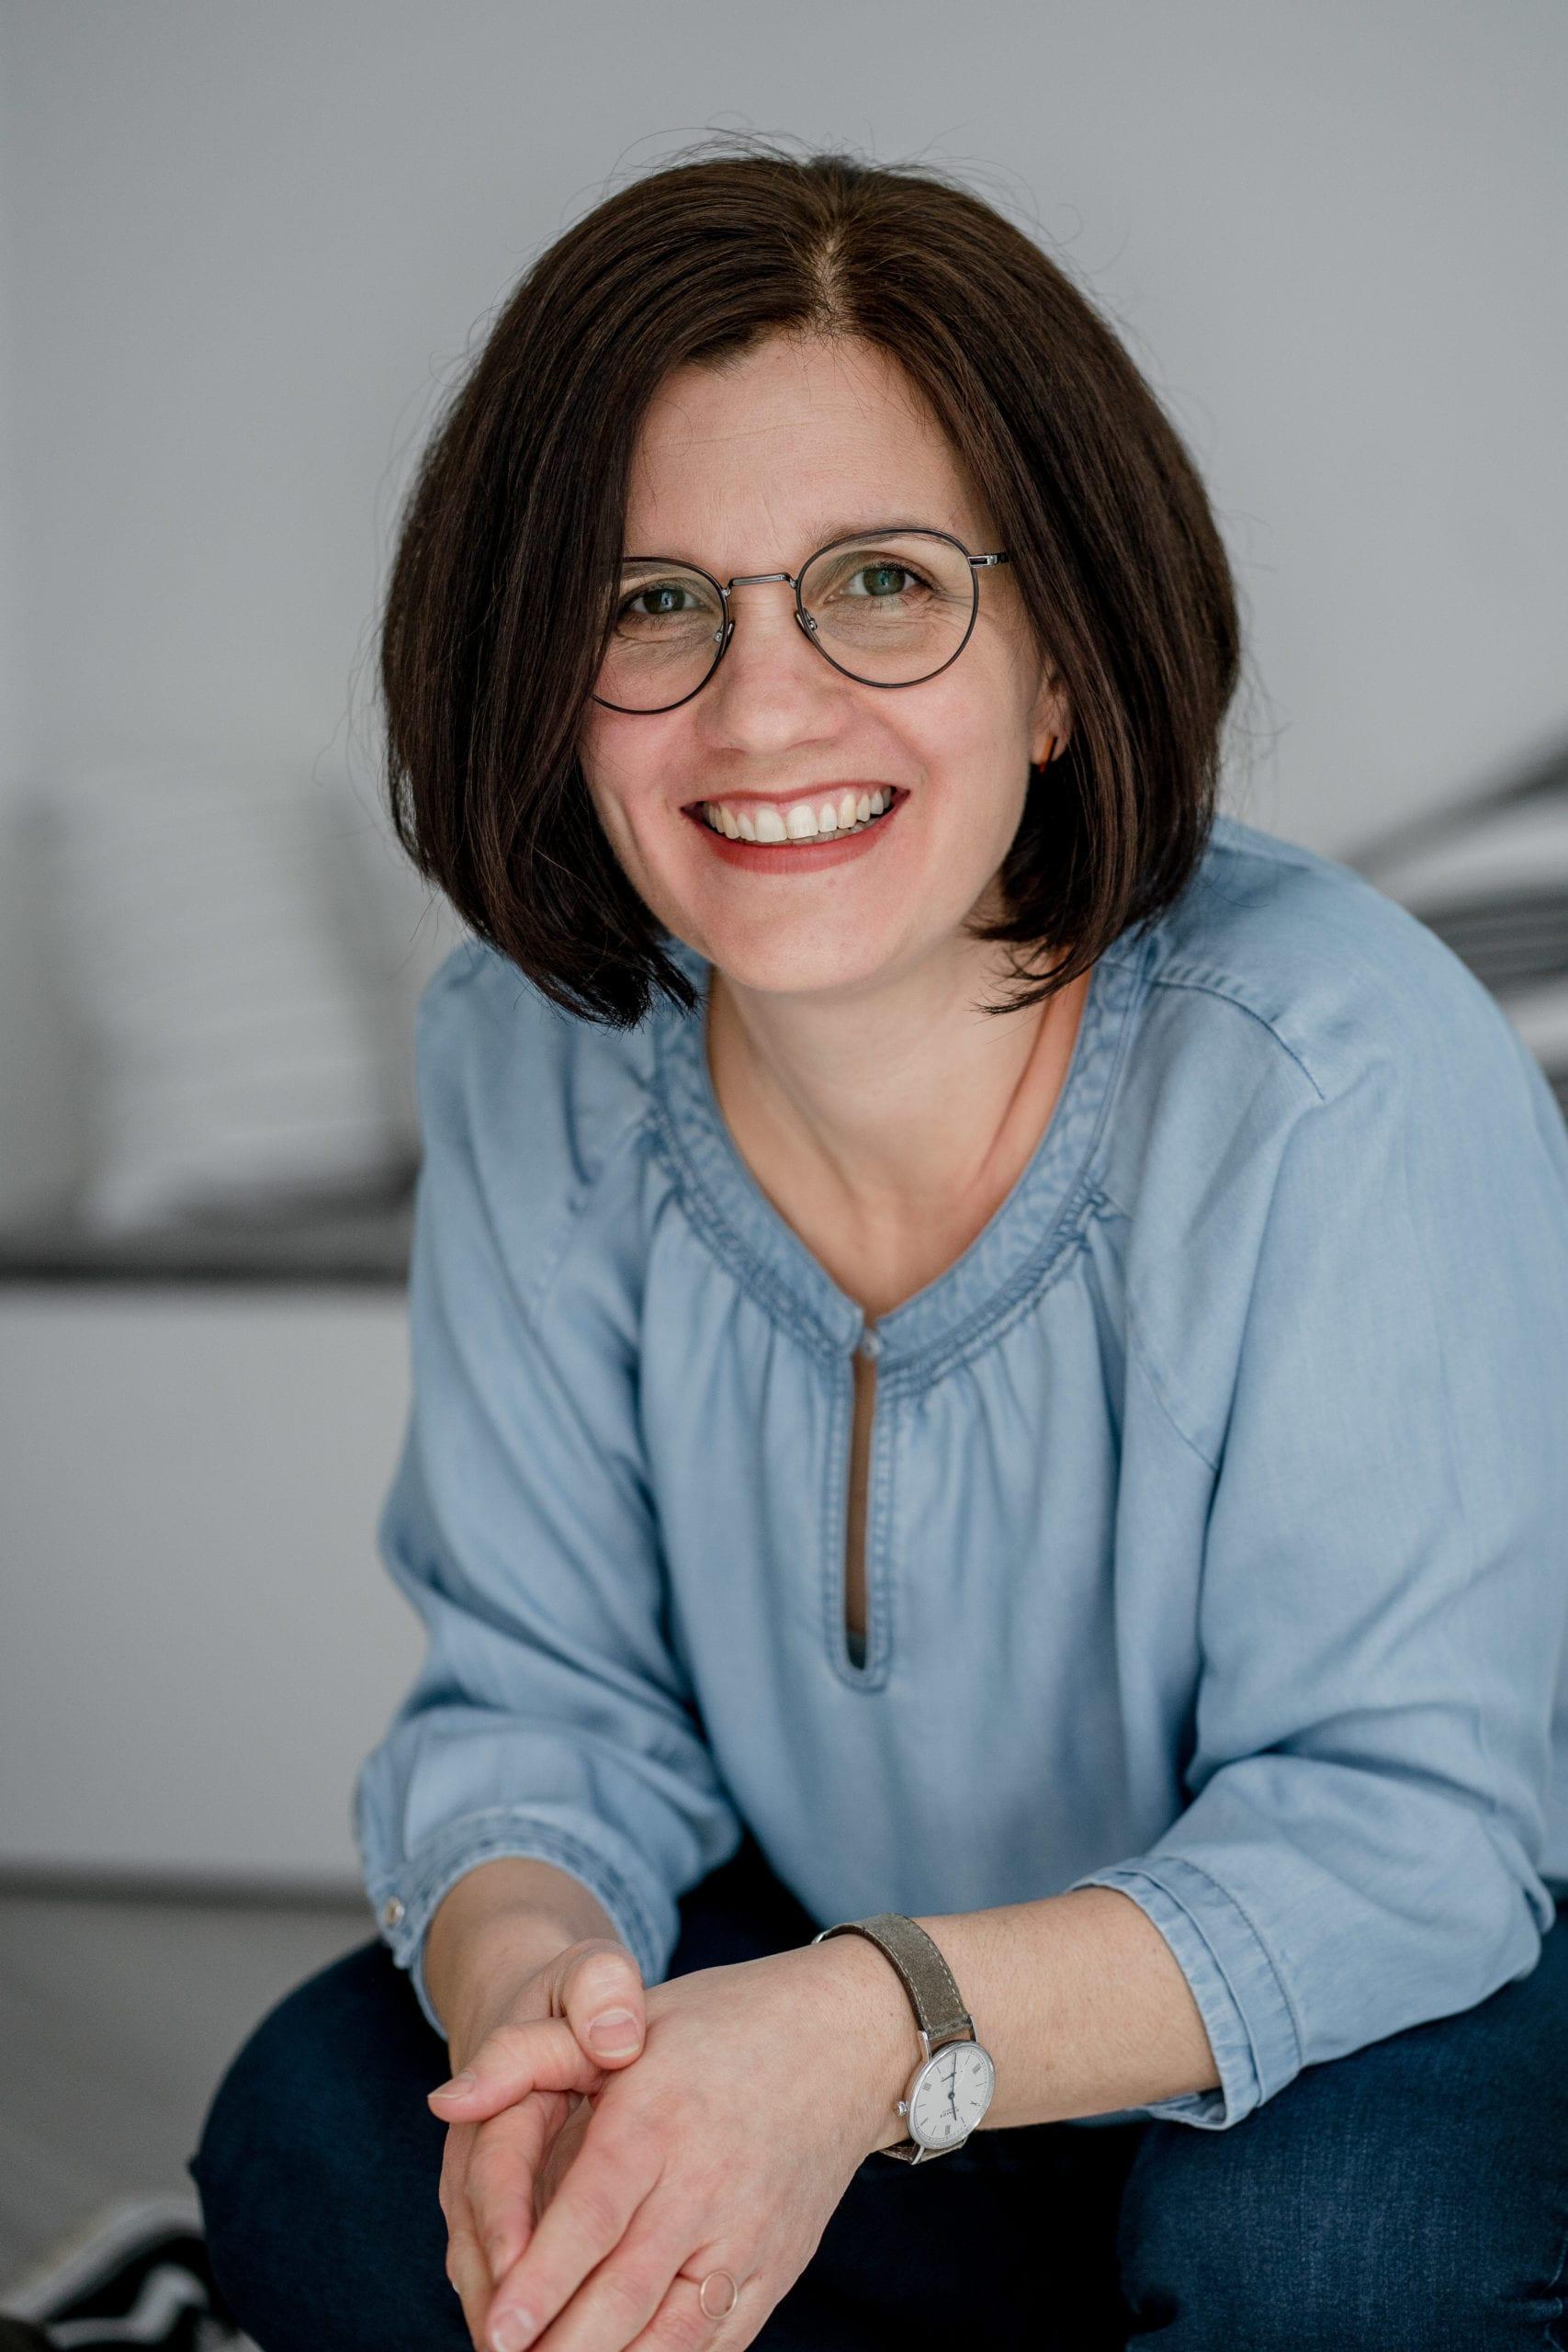 Evelyn Hufgard-Steigerwald